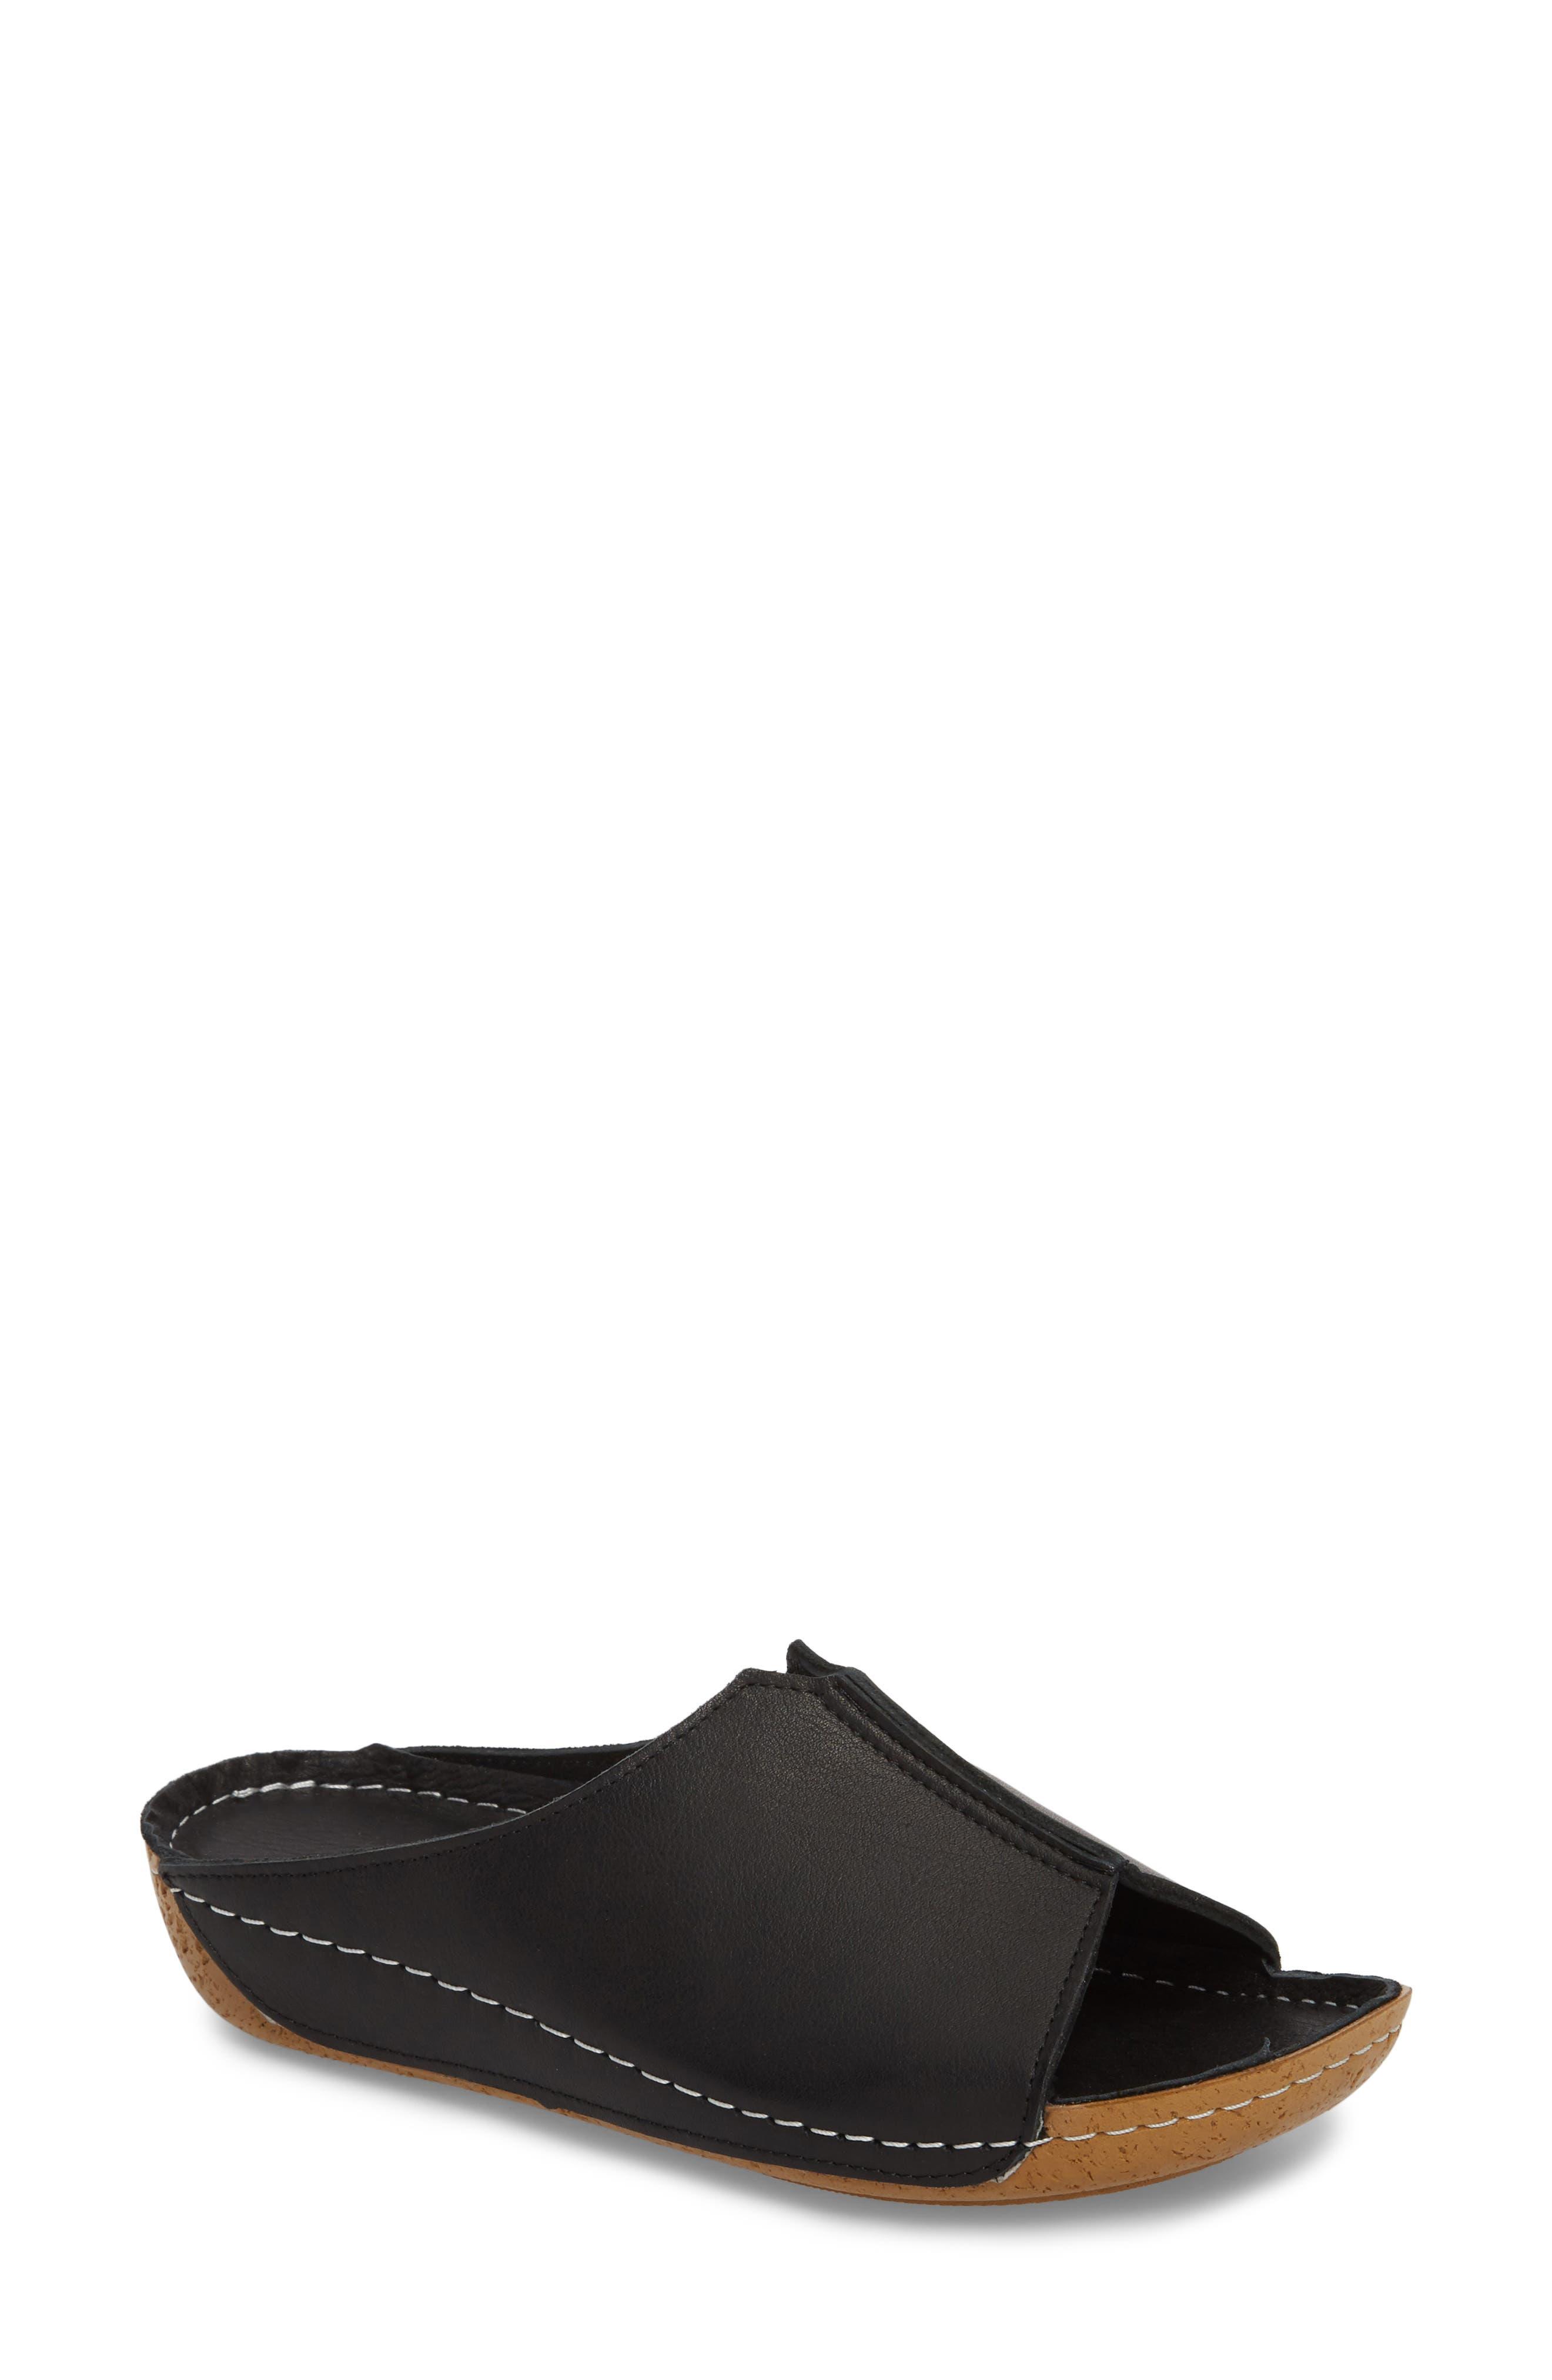 Sheridan Mia Alexa 3 Slide Sandal (Women)